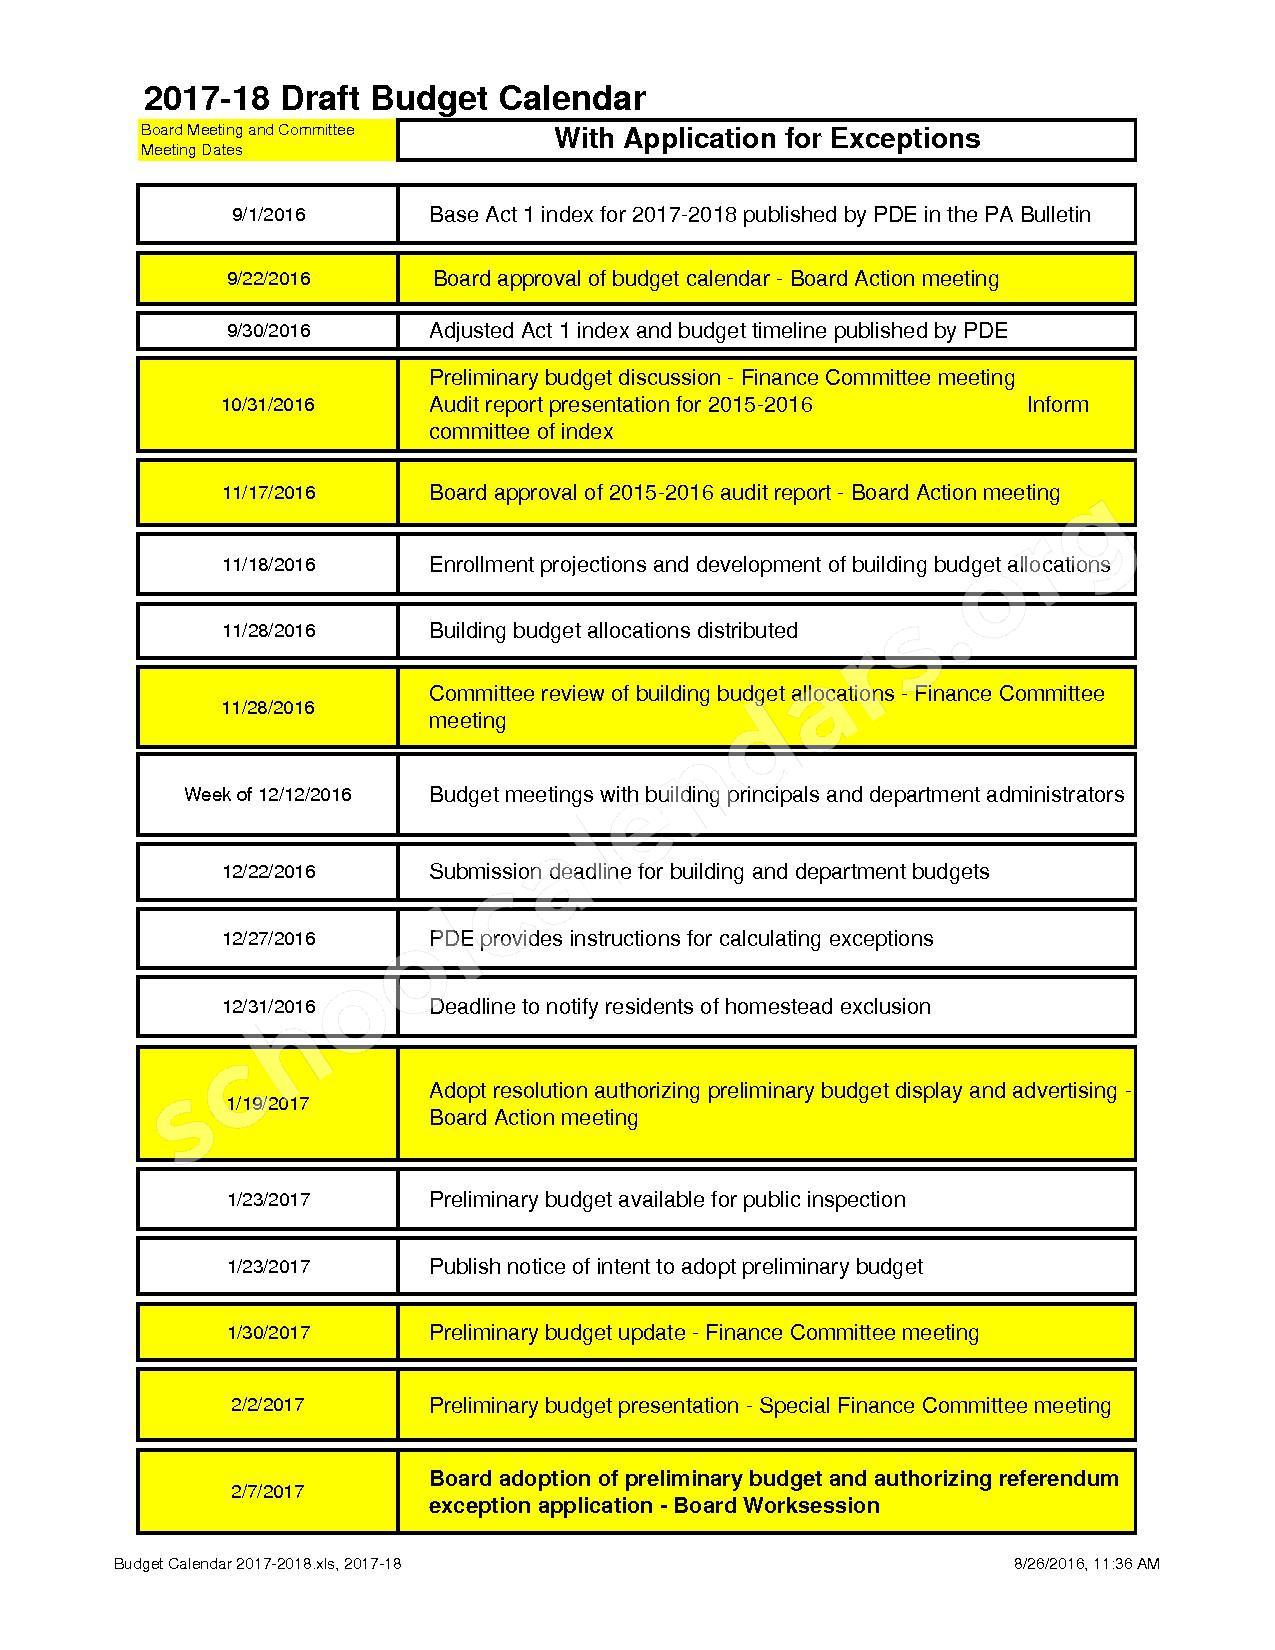 2017 – 2018 School Calendar | North Penn School District Regarding North Penn District Calendar